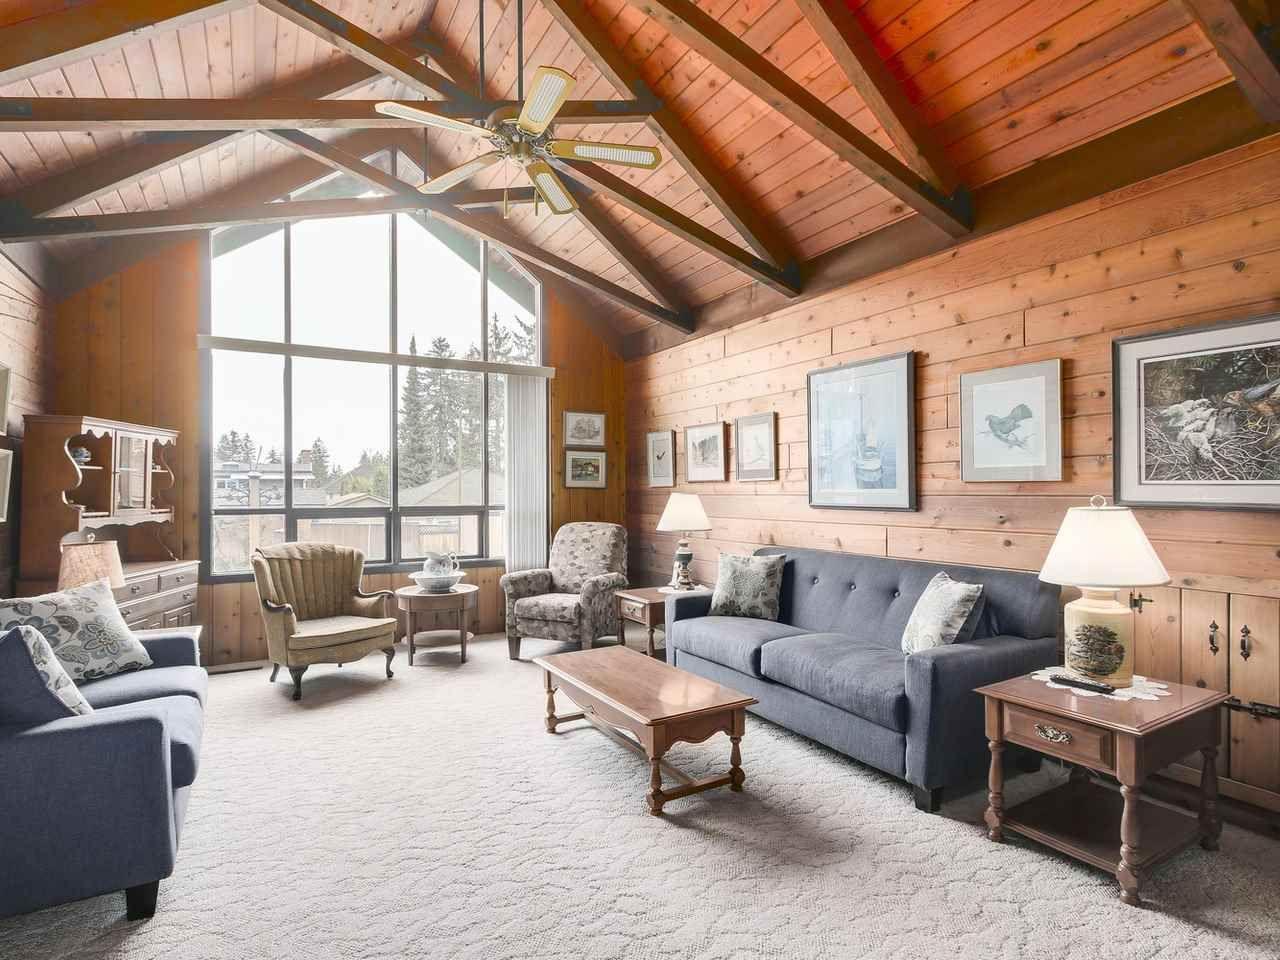 Photo 2: Photos: 1320 REGAN Avenue in Coquitlam: Central Coquitlam House for sale : MLS®# R2147096